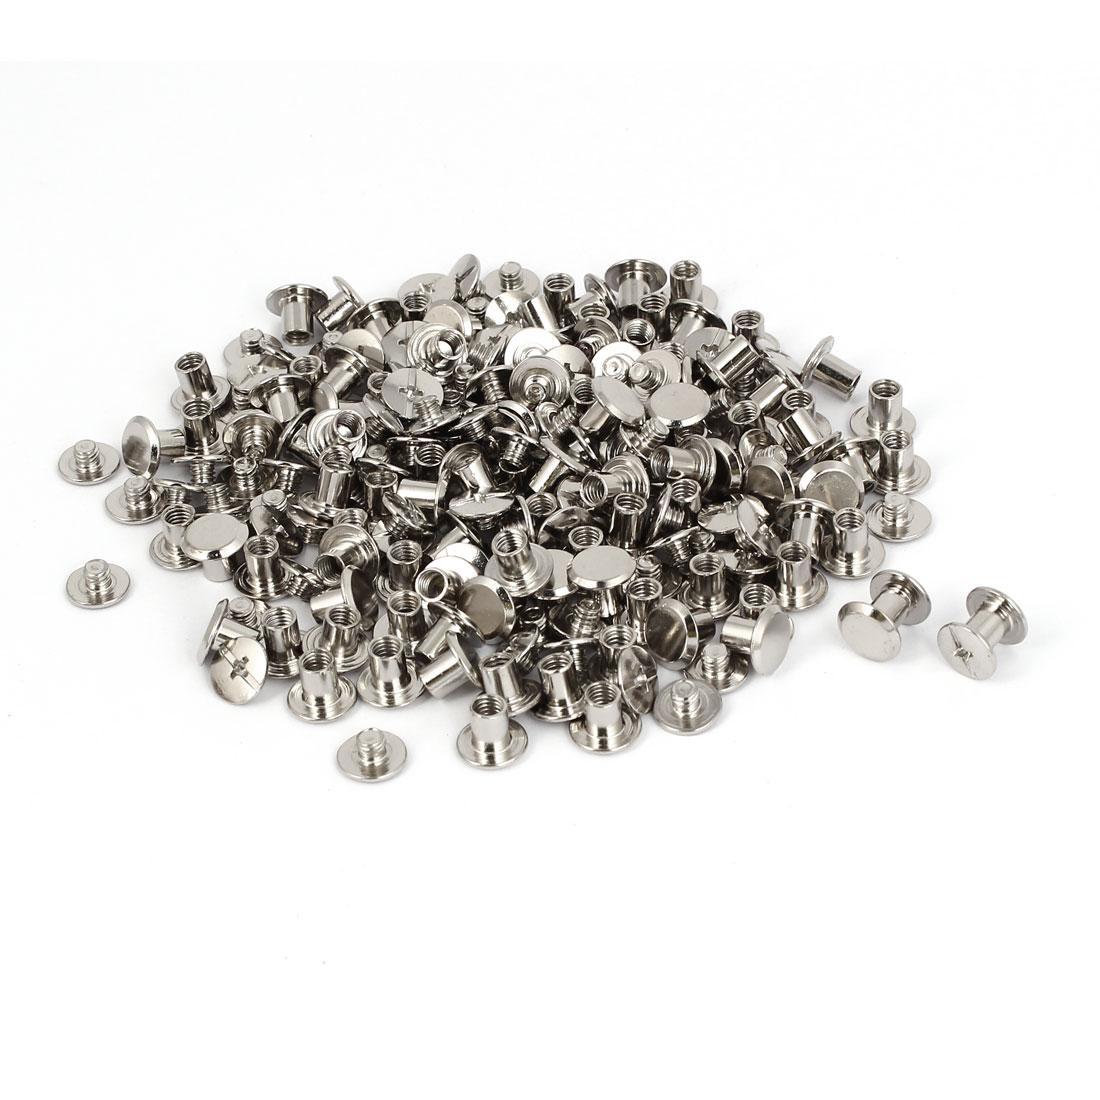 M5x6mm Photo Albums Scrapbook Metal Binding Screw Post Silver Tone 100 Pcs